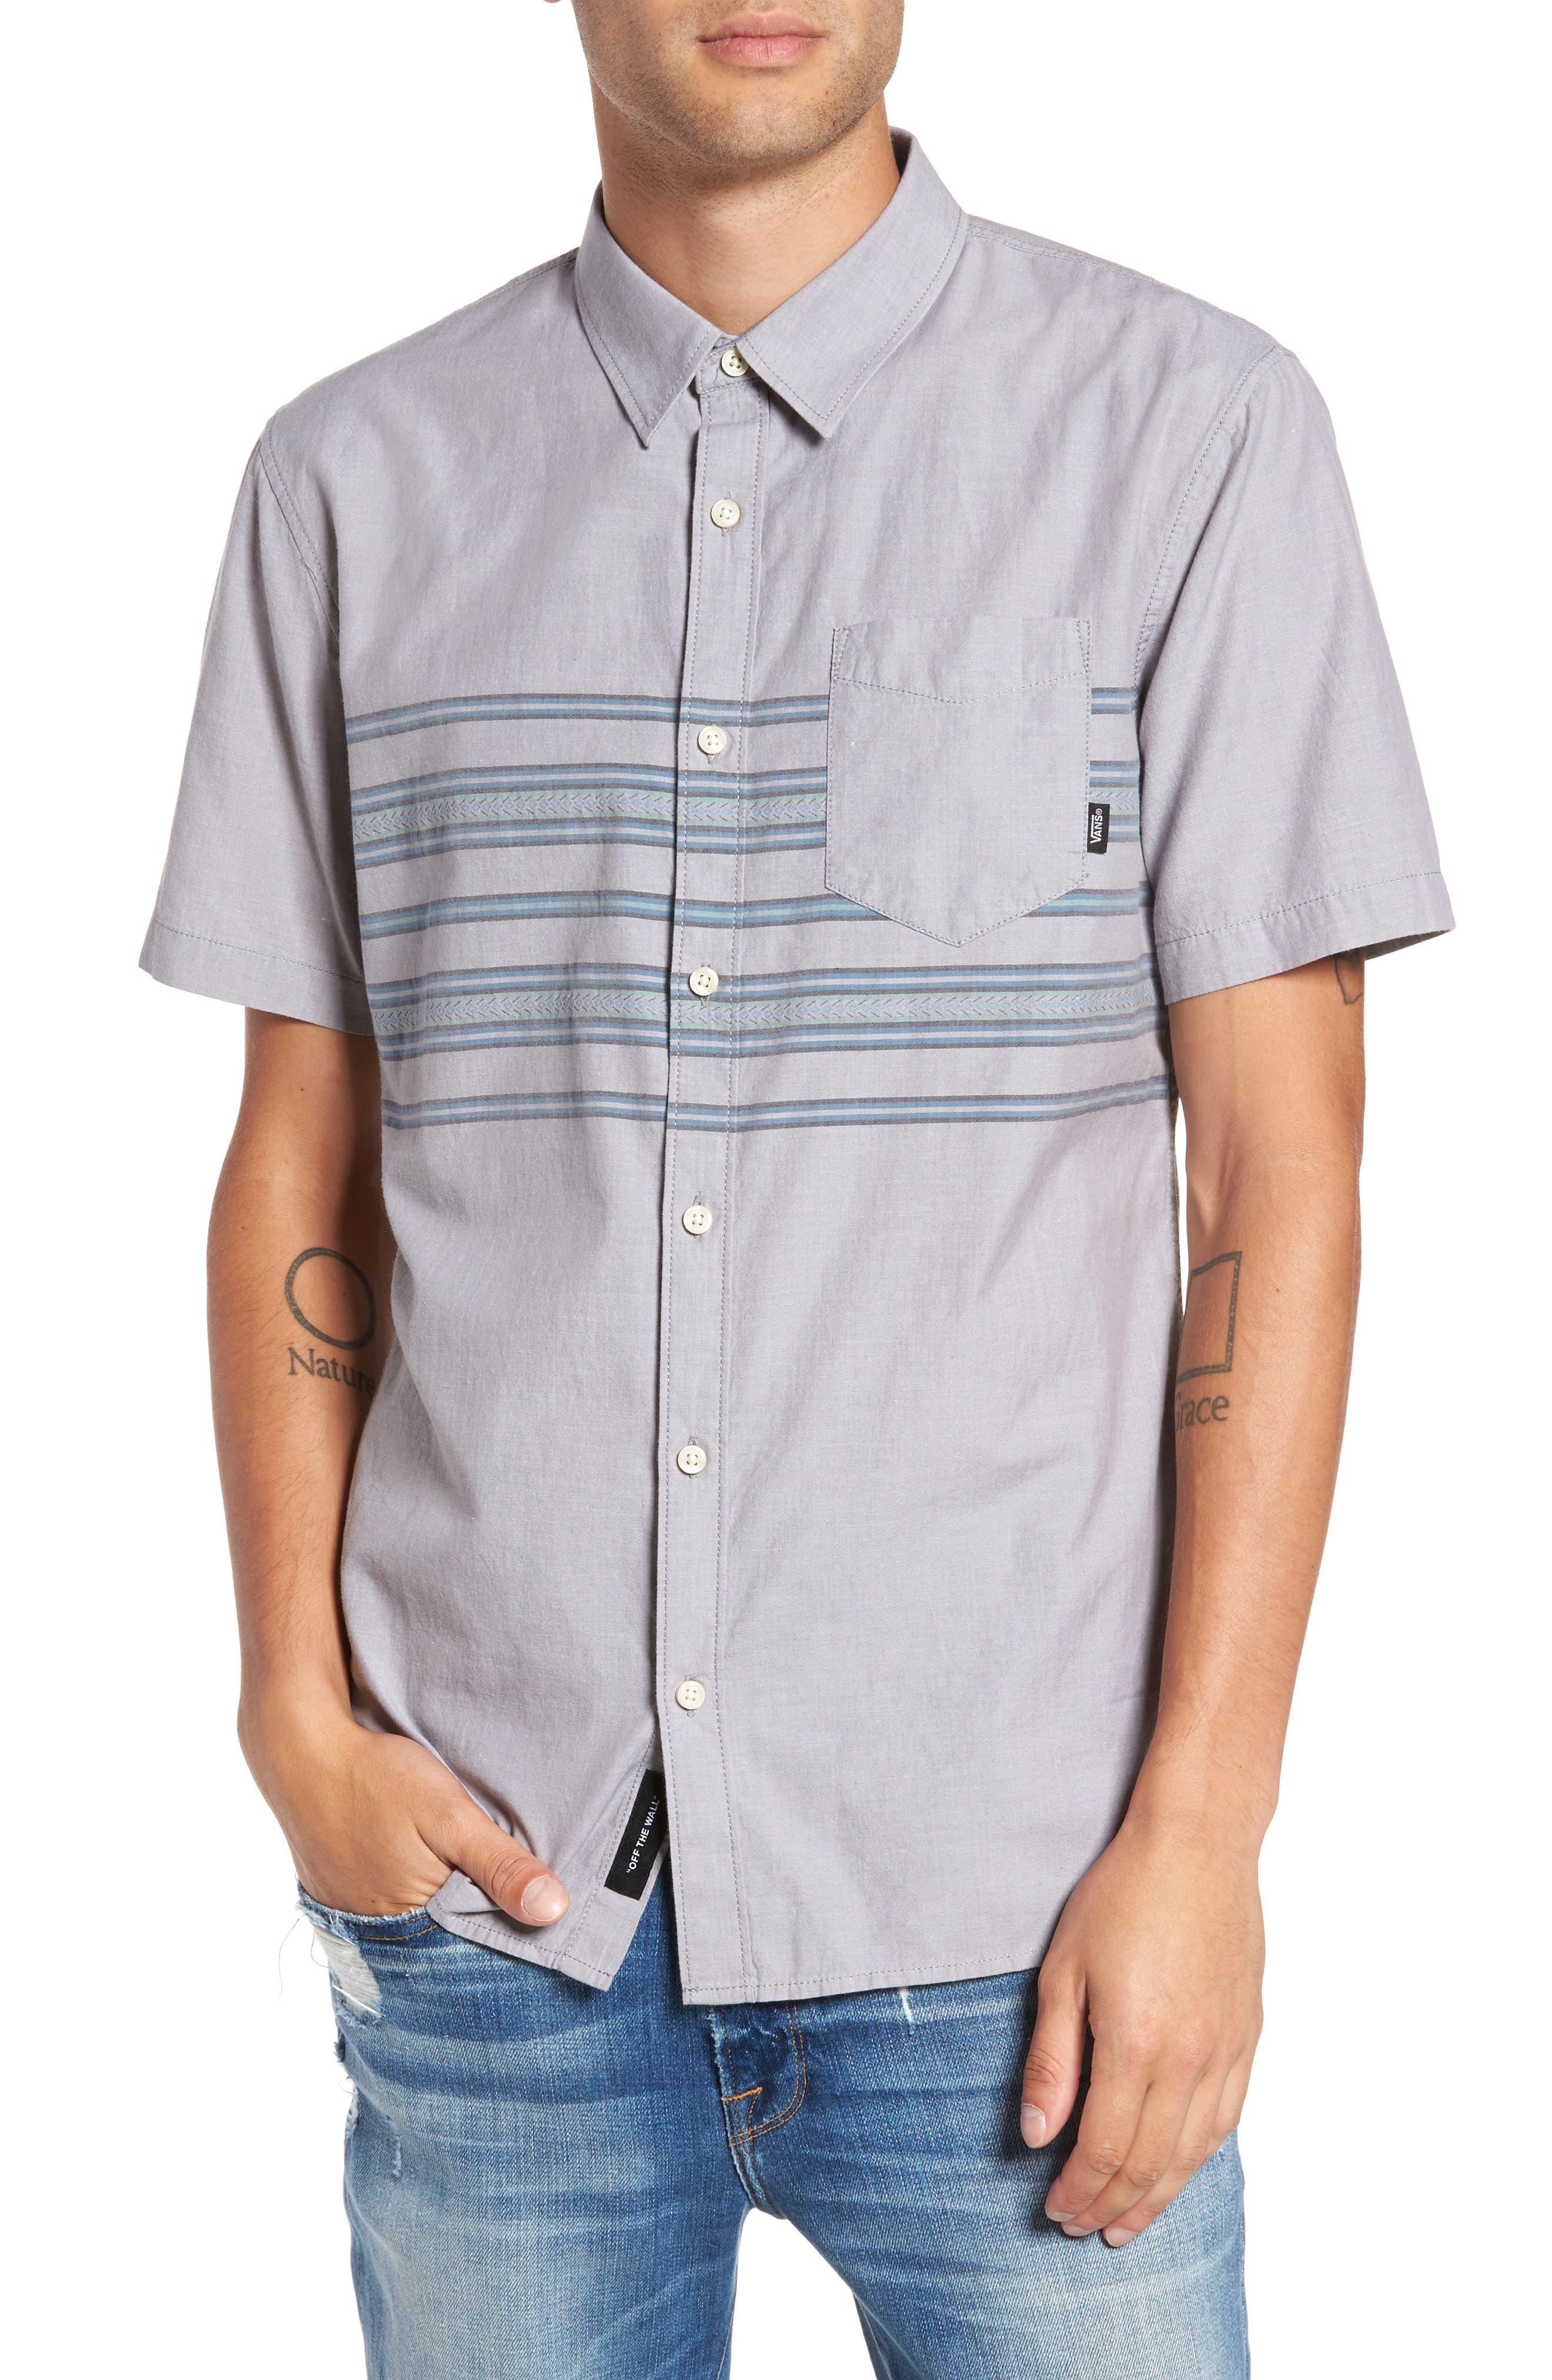 Benmore Striped Woven Shirt,                             Main thumbnail 1, color,                             021